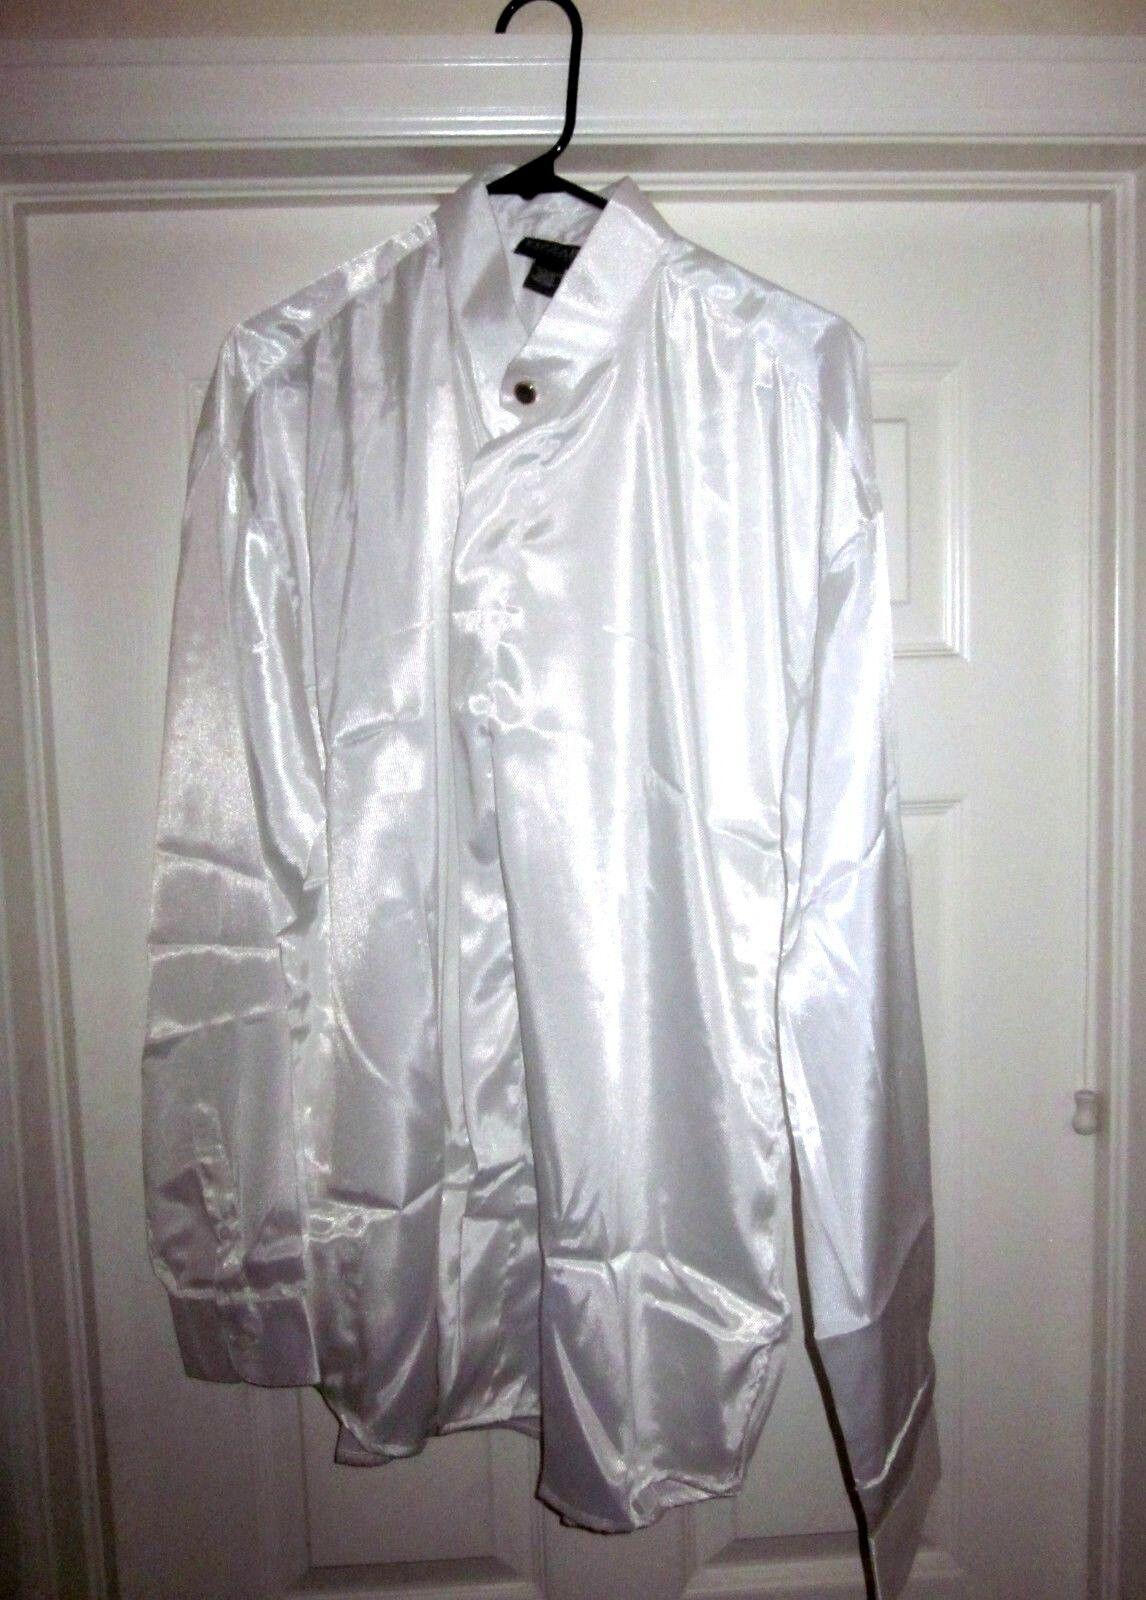 FIZZARO Sultanate Of Oman Men's Long Sleeve Dress Shirt XL 100% Polyester